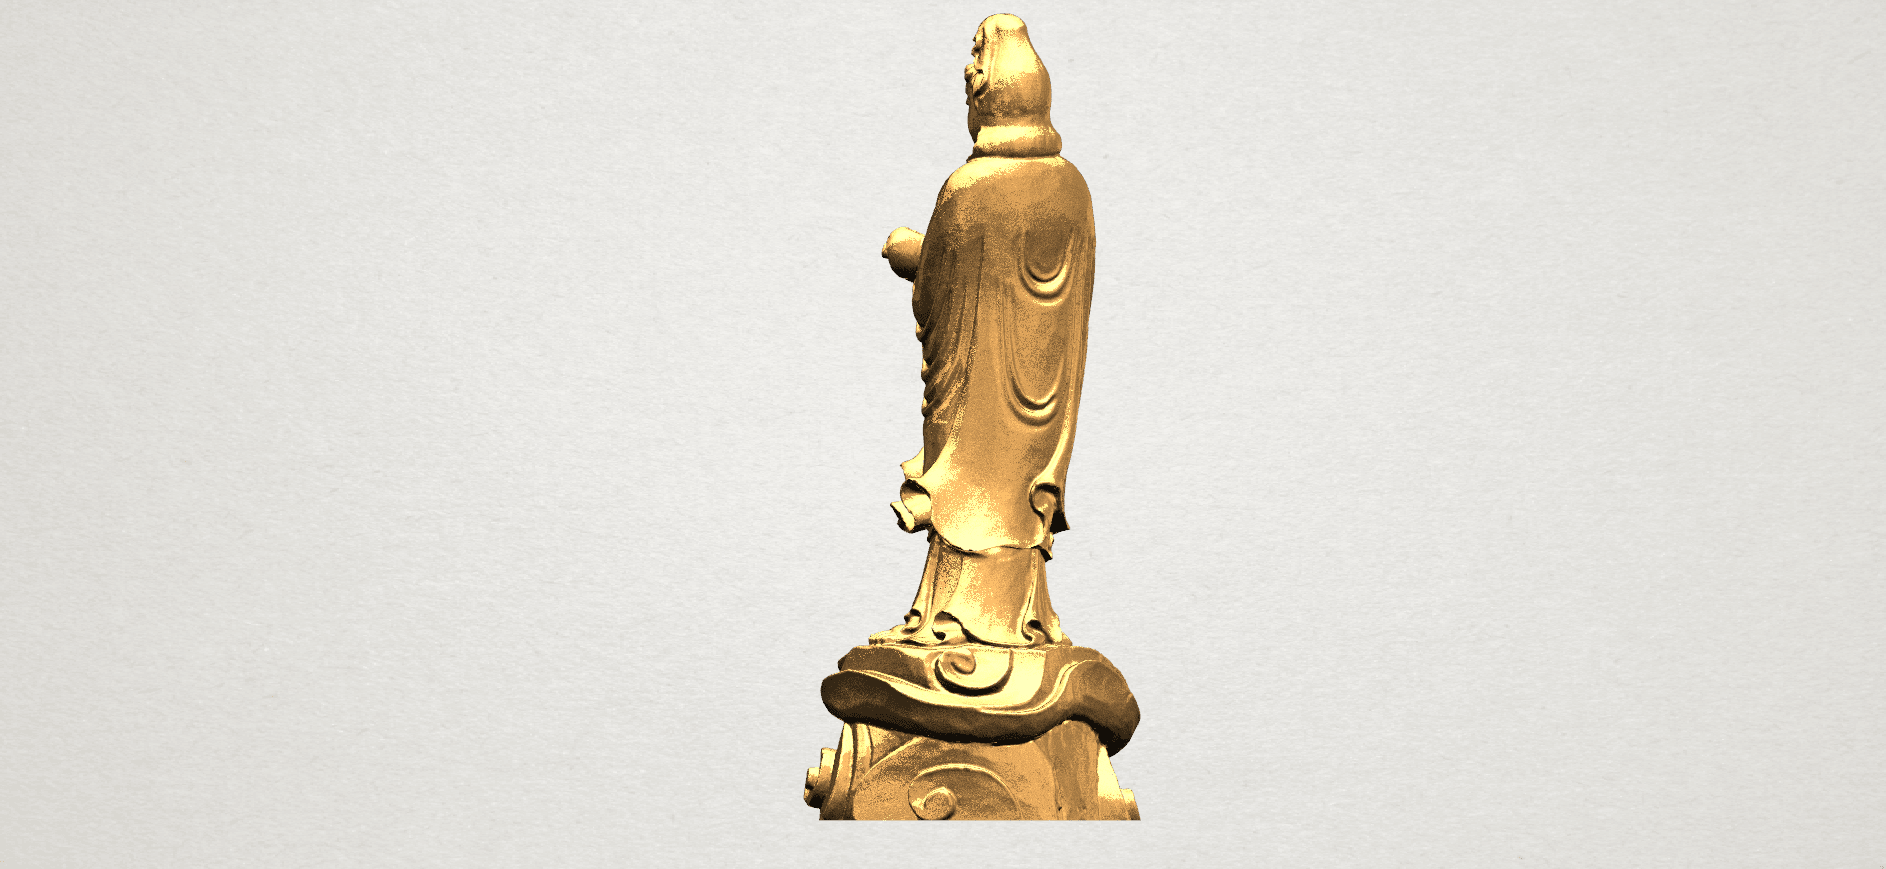 Avalokitesvara Buddha - Standing (iv) A04.png Download free STL file Avalokitesvara Buddha - Standing 04 • 3D print template, GeorgesNikkei